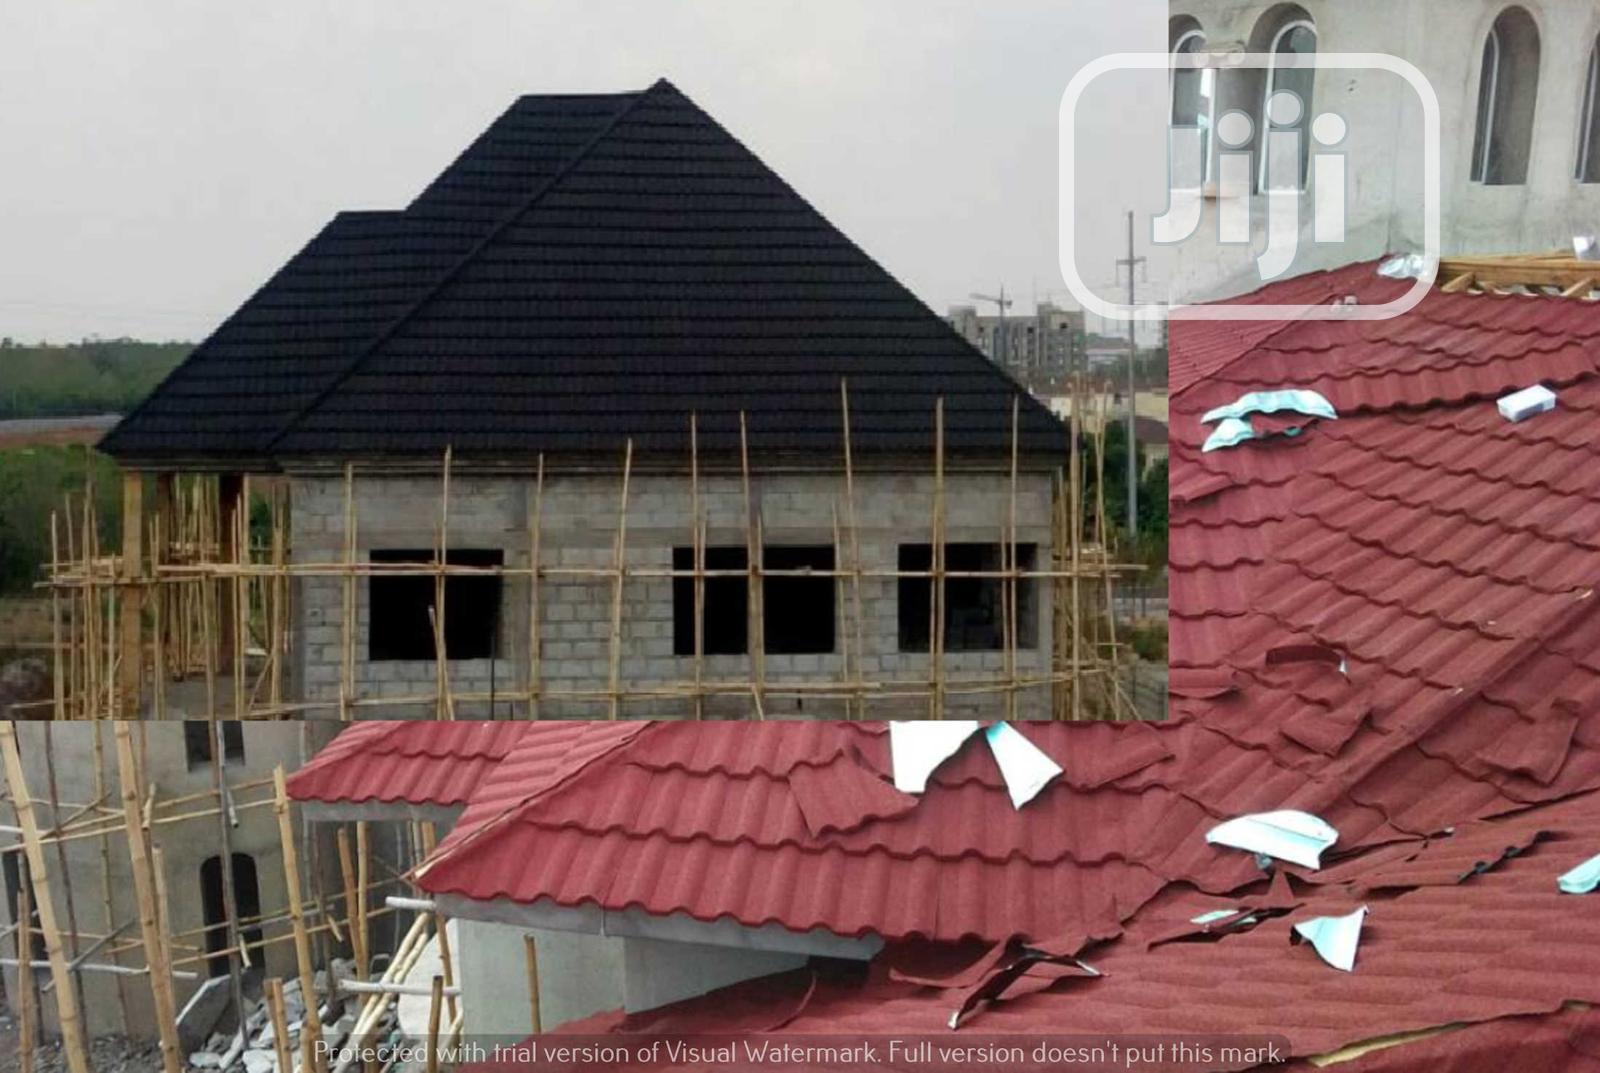 Bond Durable New Zealand Tilcor Stone Coated Gerard Roof